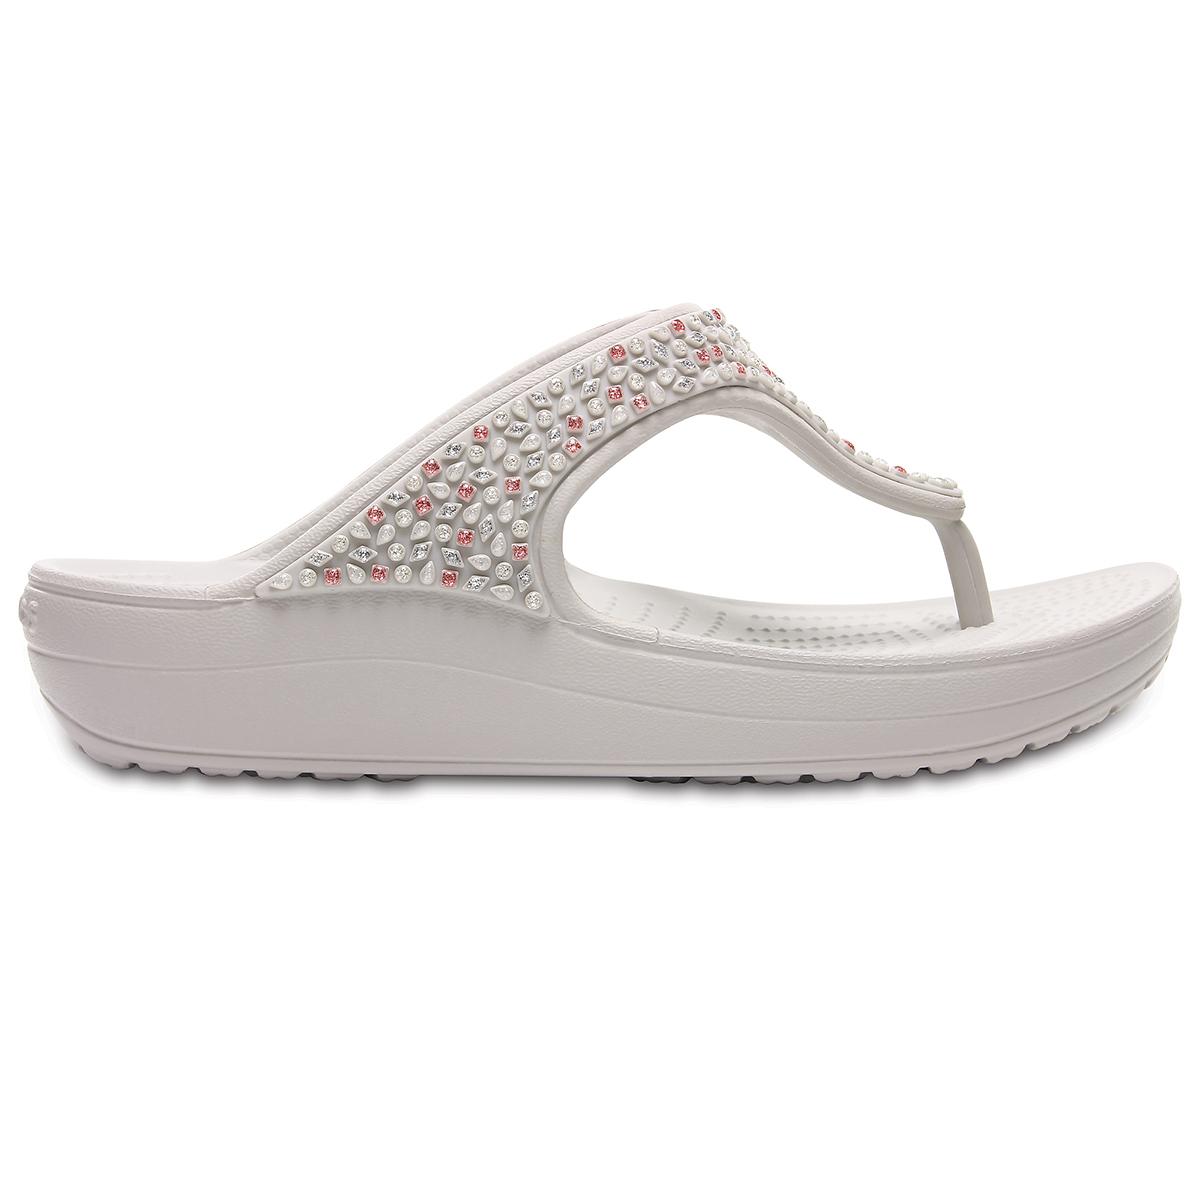 Crocs Sloane Embellished Flip - İnci Beyazı